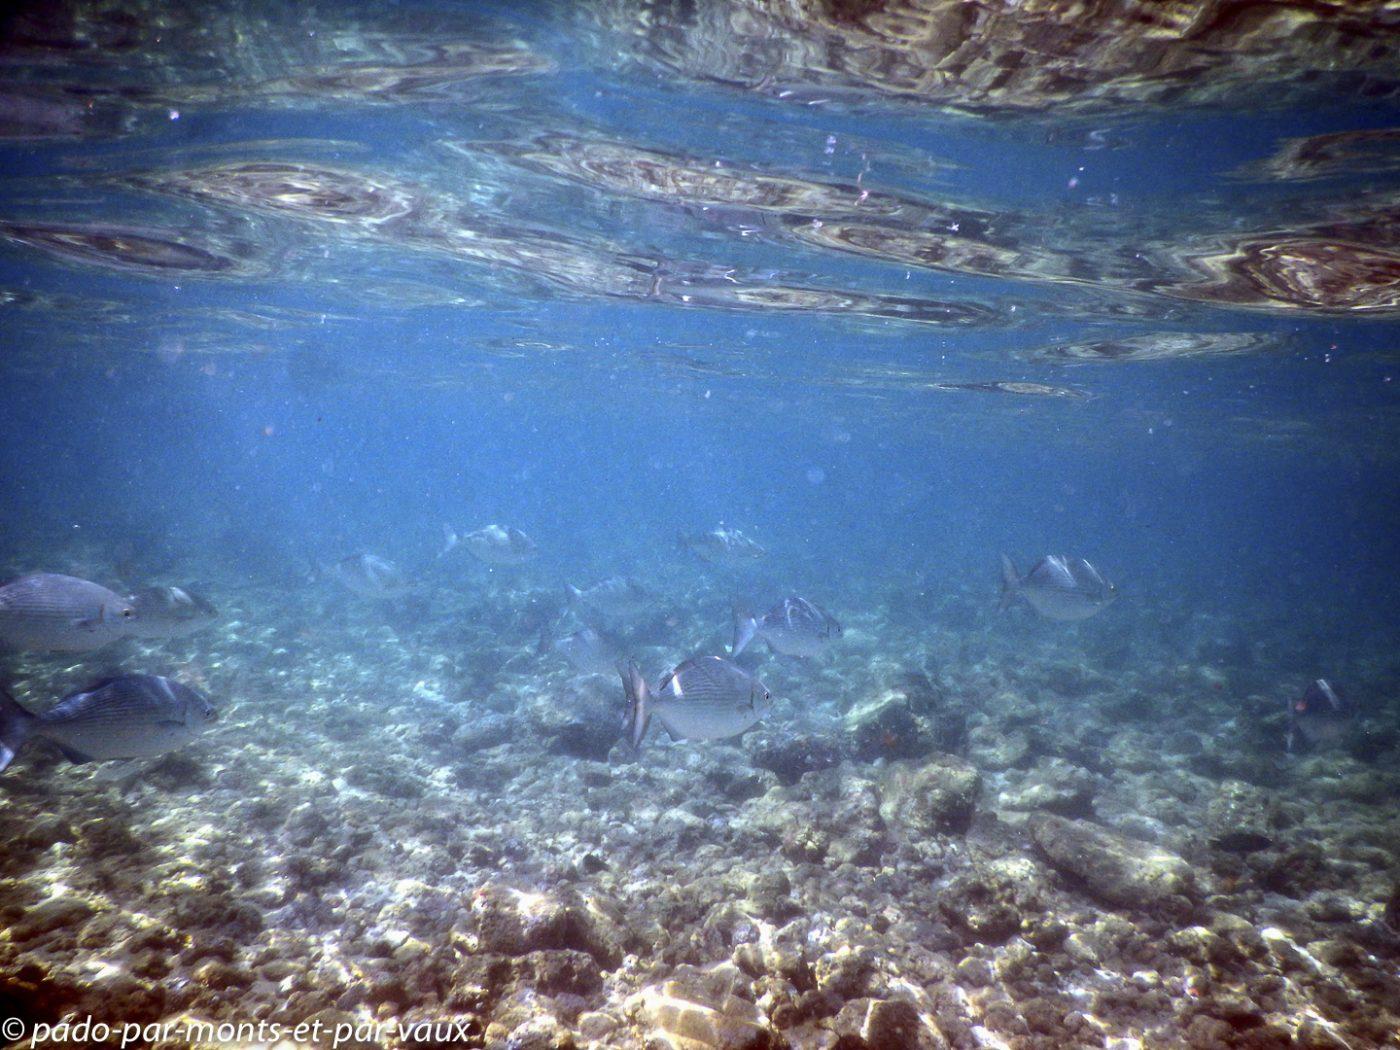 Kauai - Poipu beach park - Grey chub